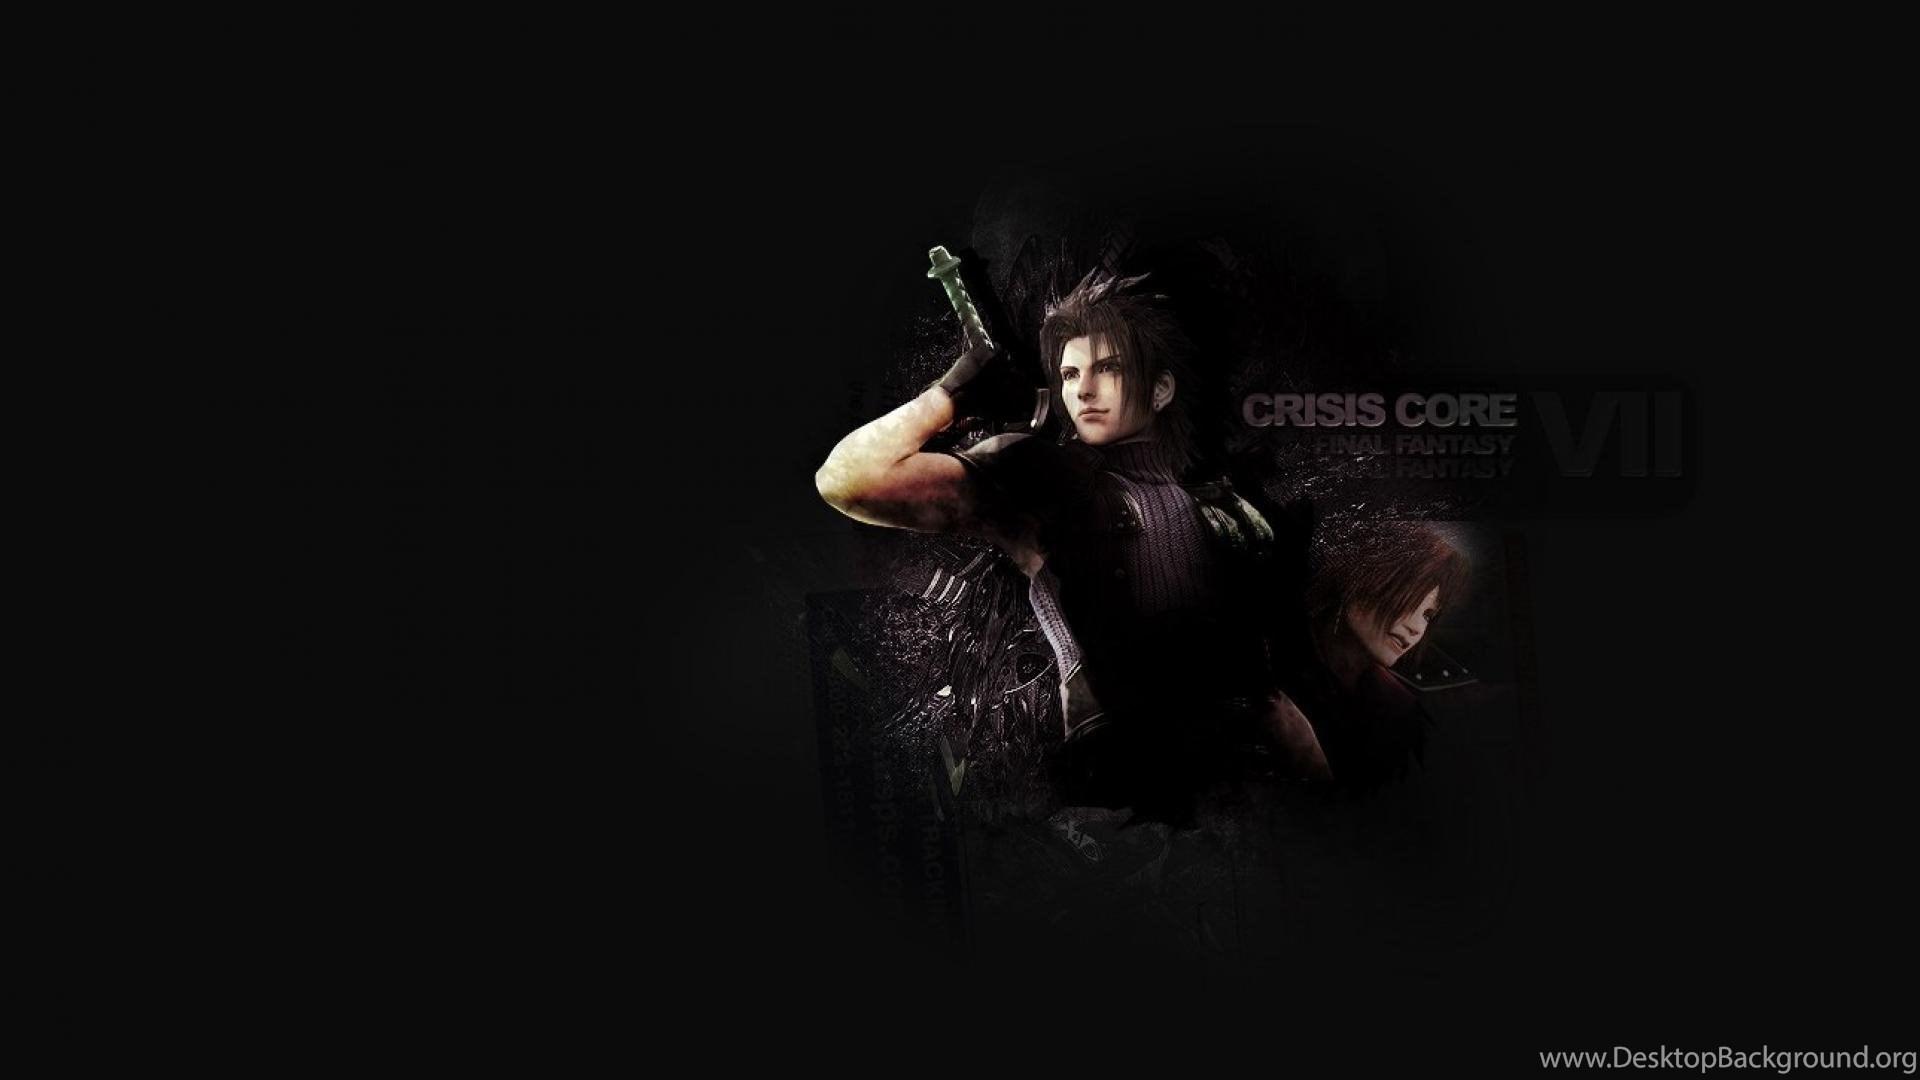 Final Fantasy Vii Crisis Core Ffvii Hd Wallpapers Desktop Background